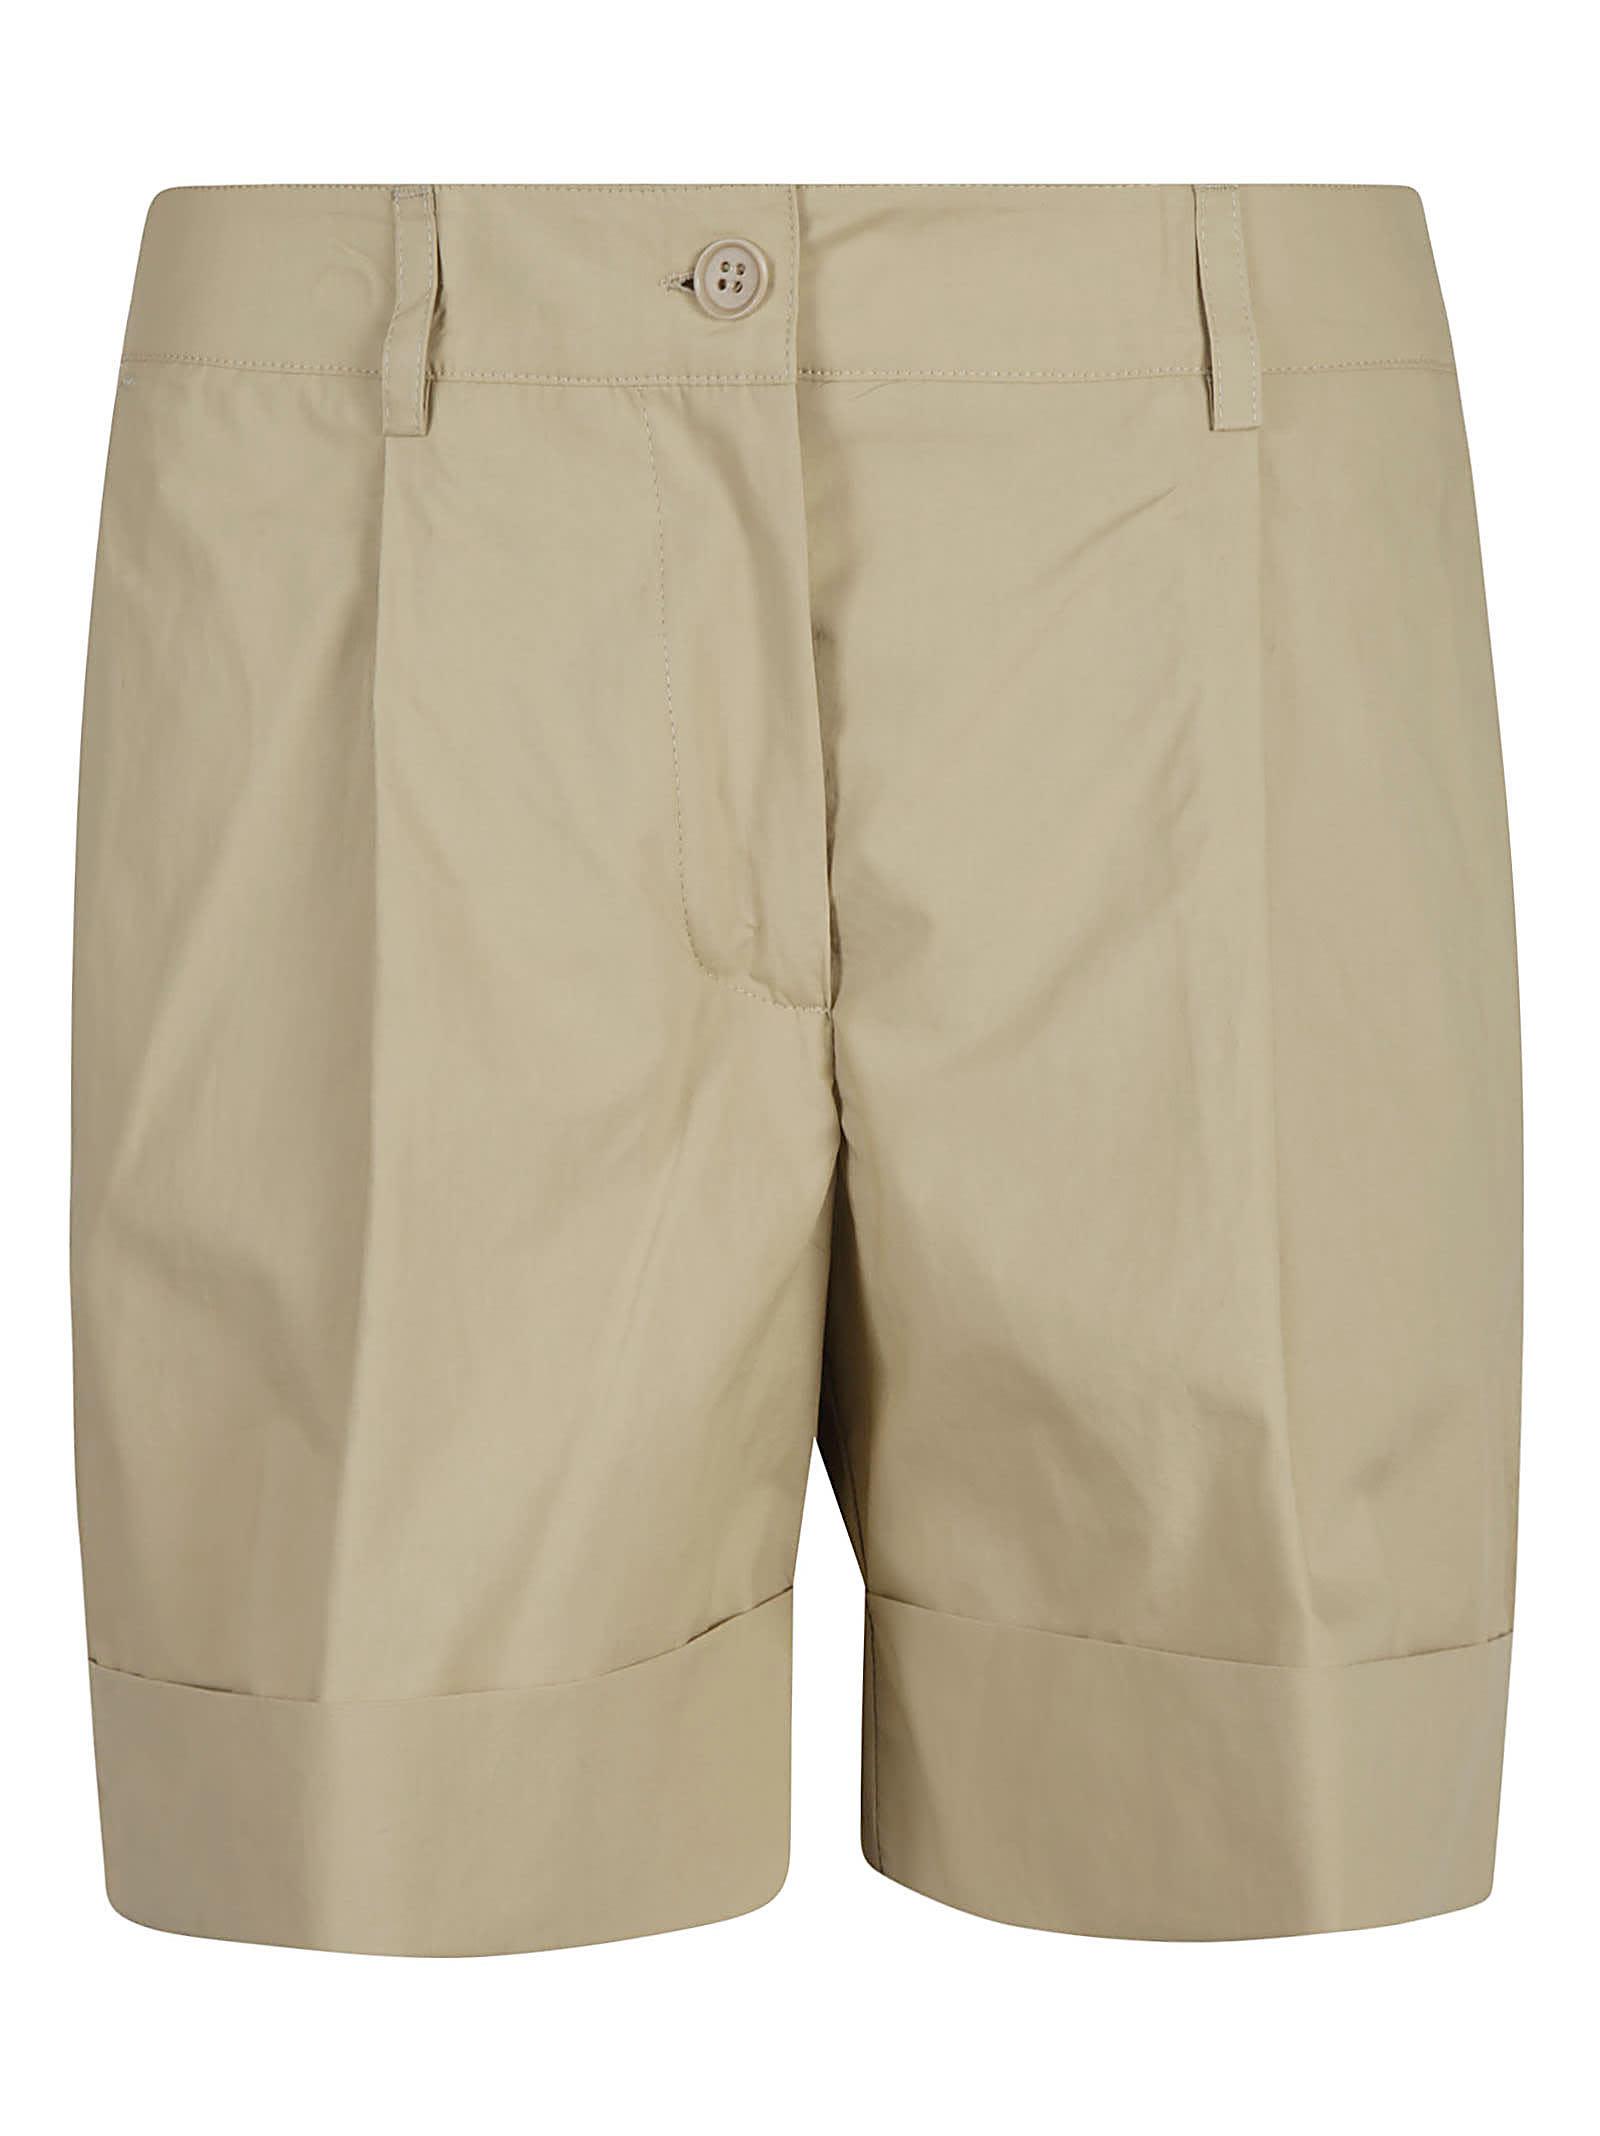 P.a.r.o.s.h. Shorts CLASSIC SHORTS